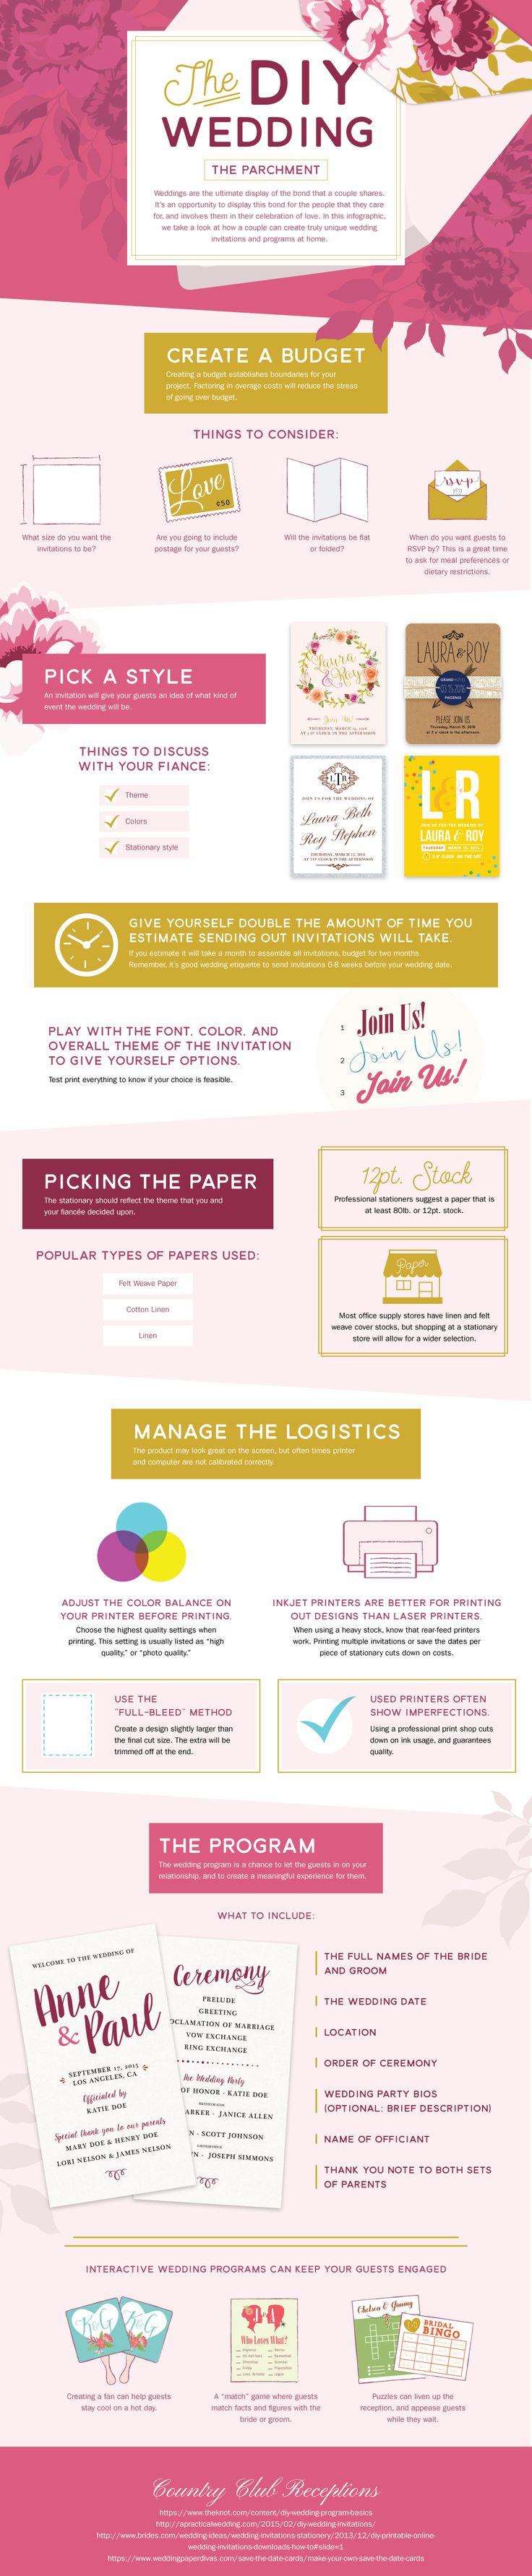 DIY Wedding Infographic